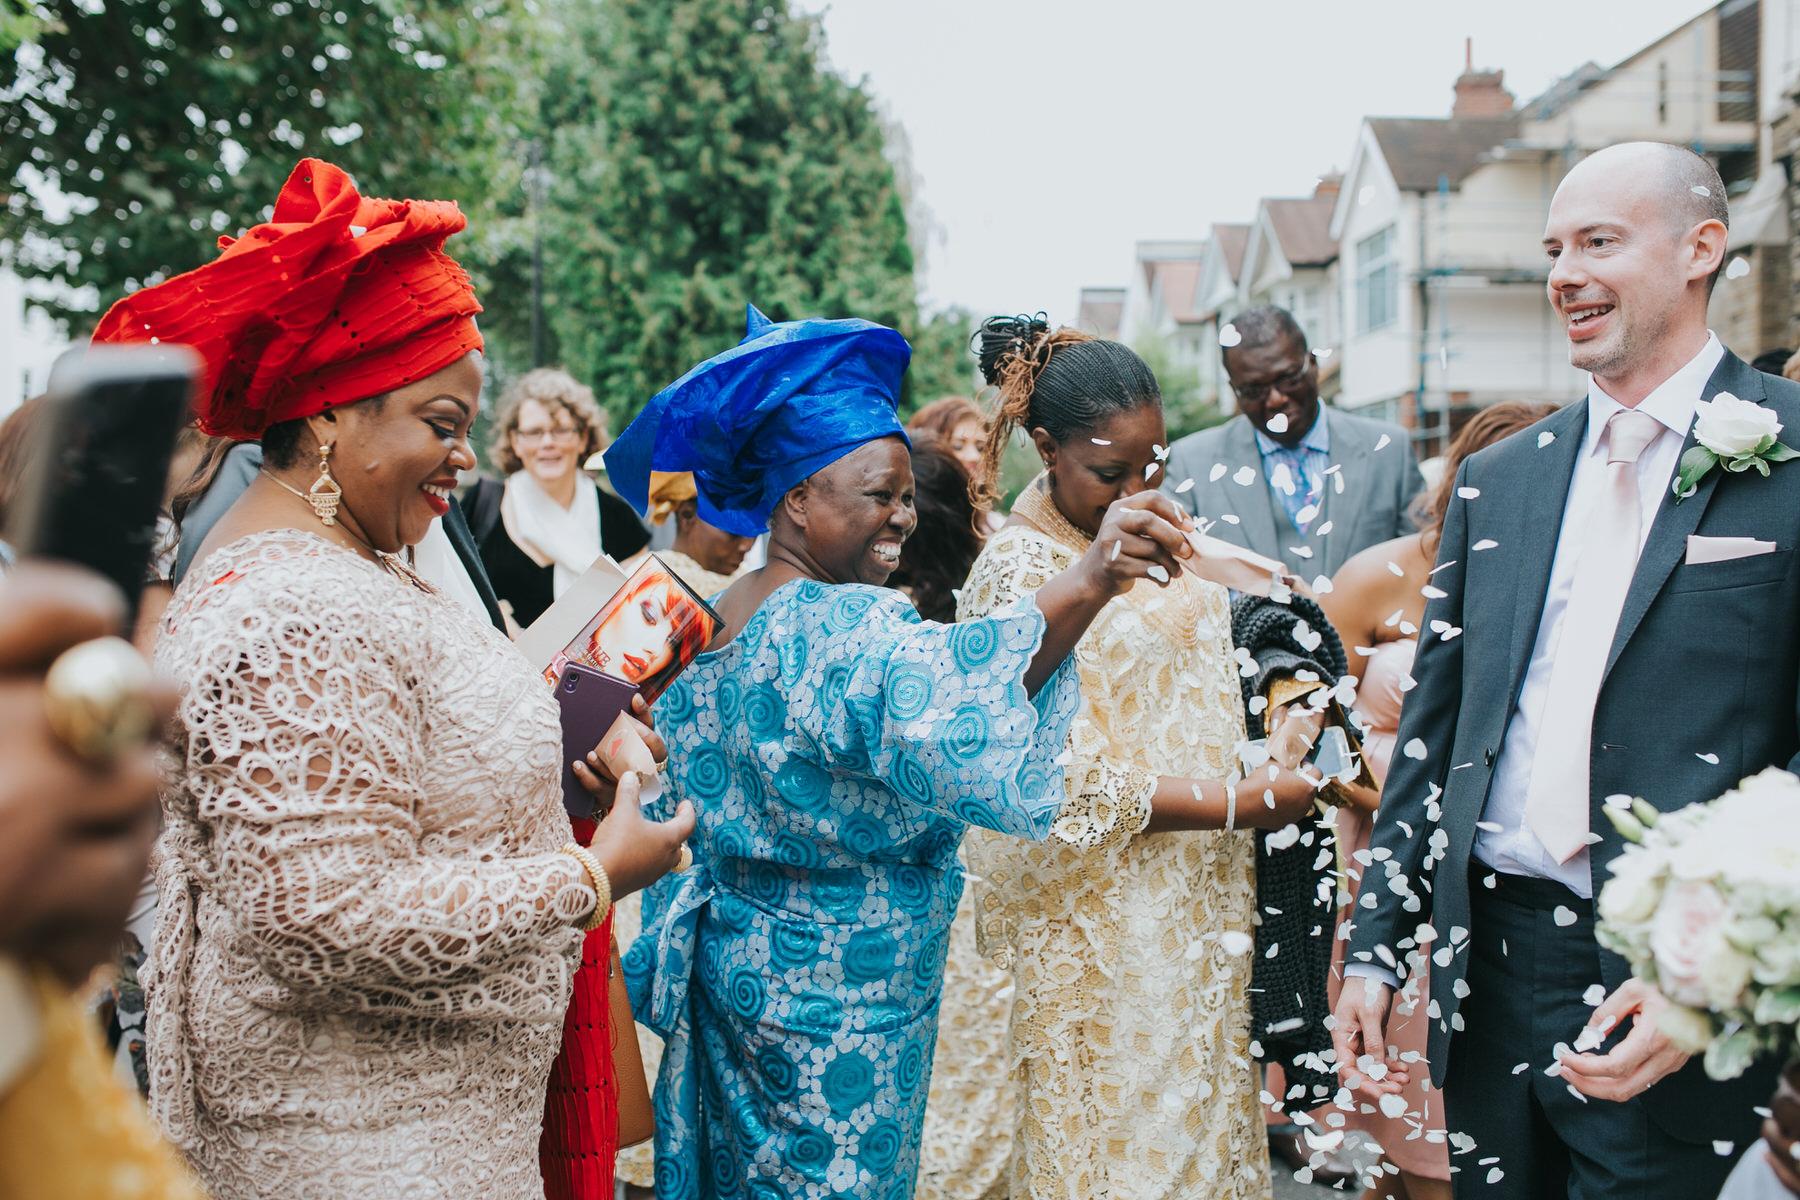 106 brides family throwing confetti Dulwich wedding photographer.jpg